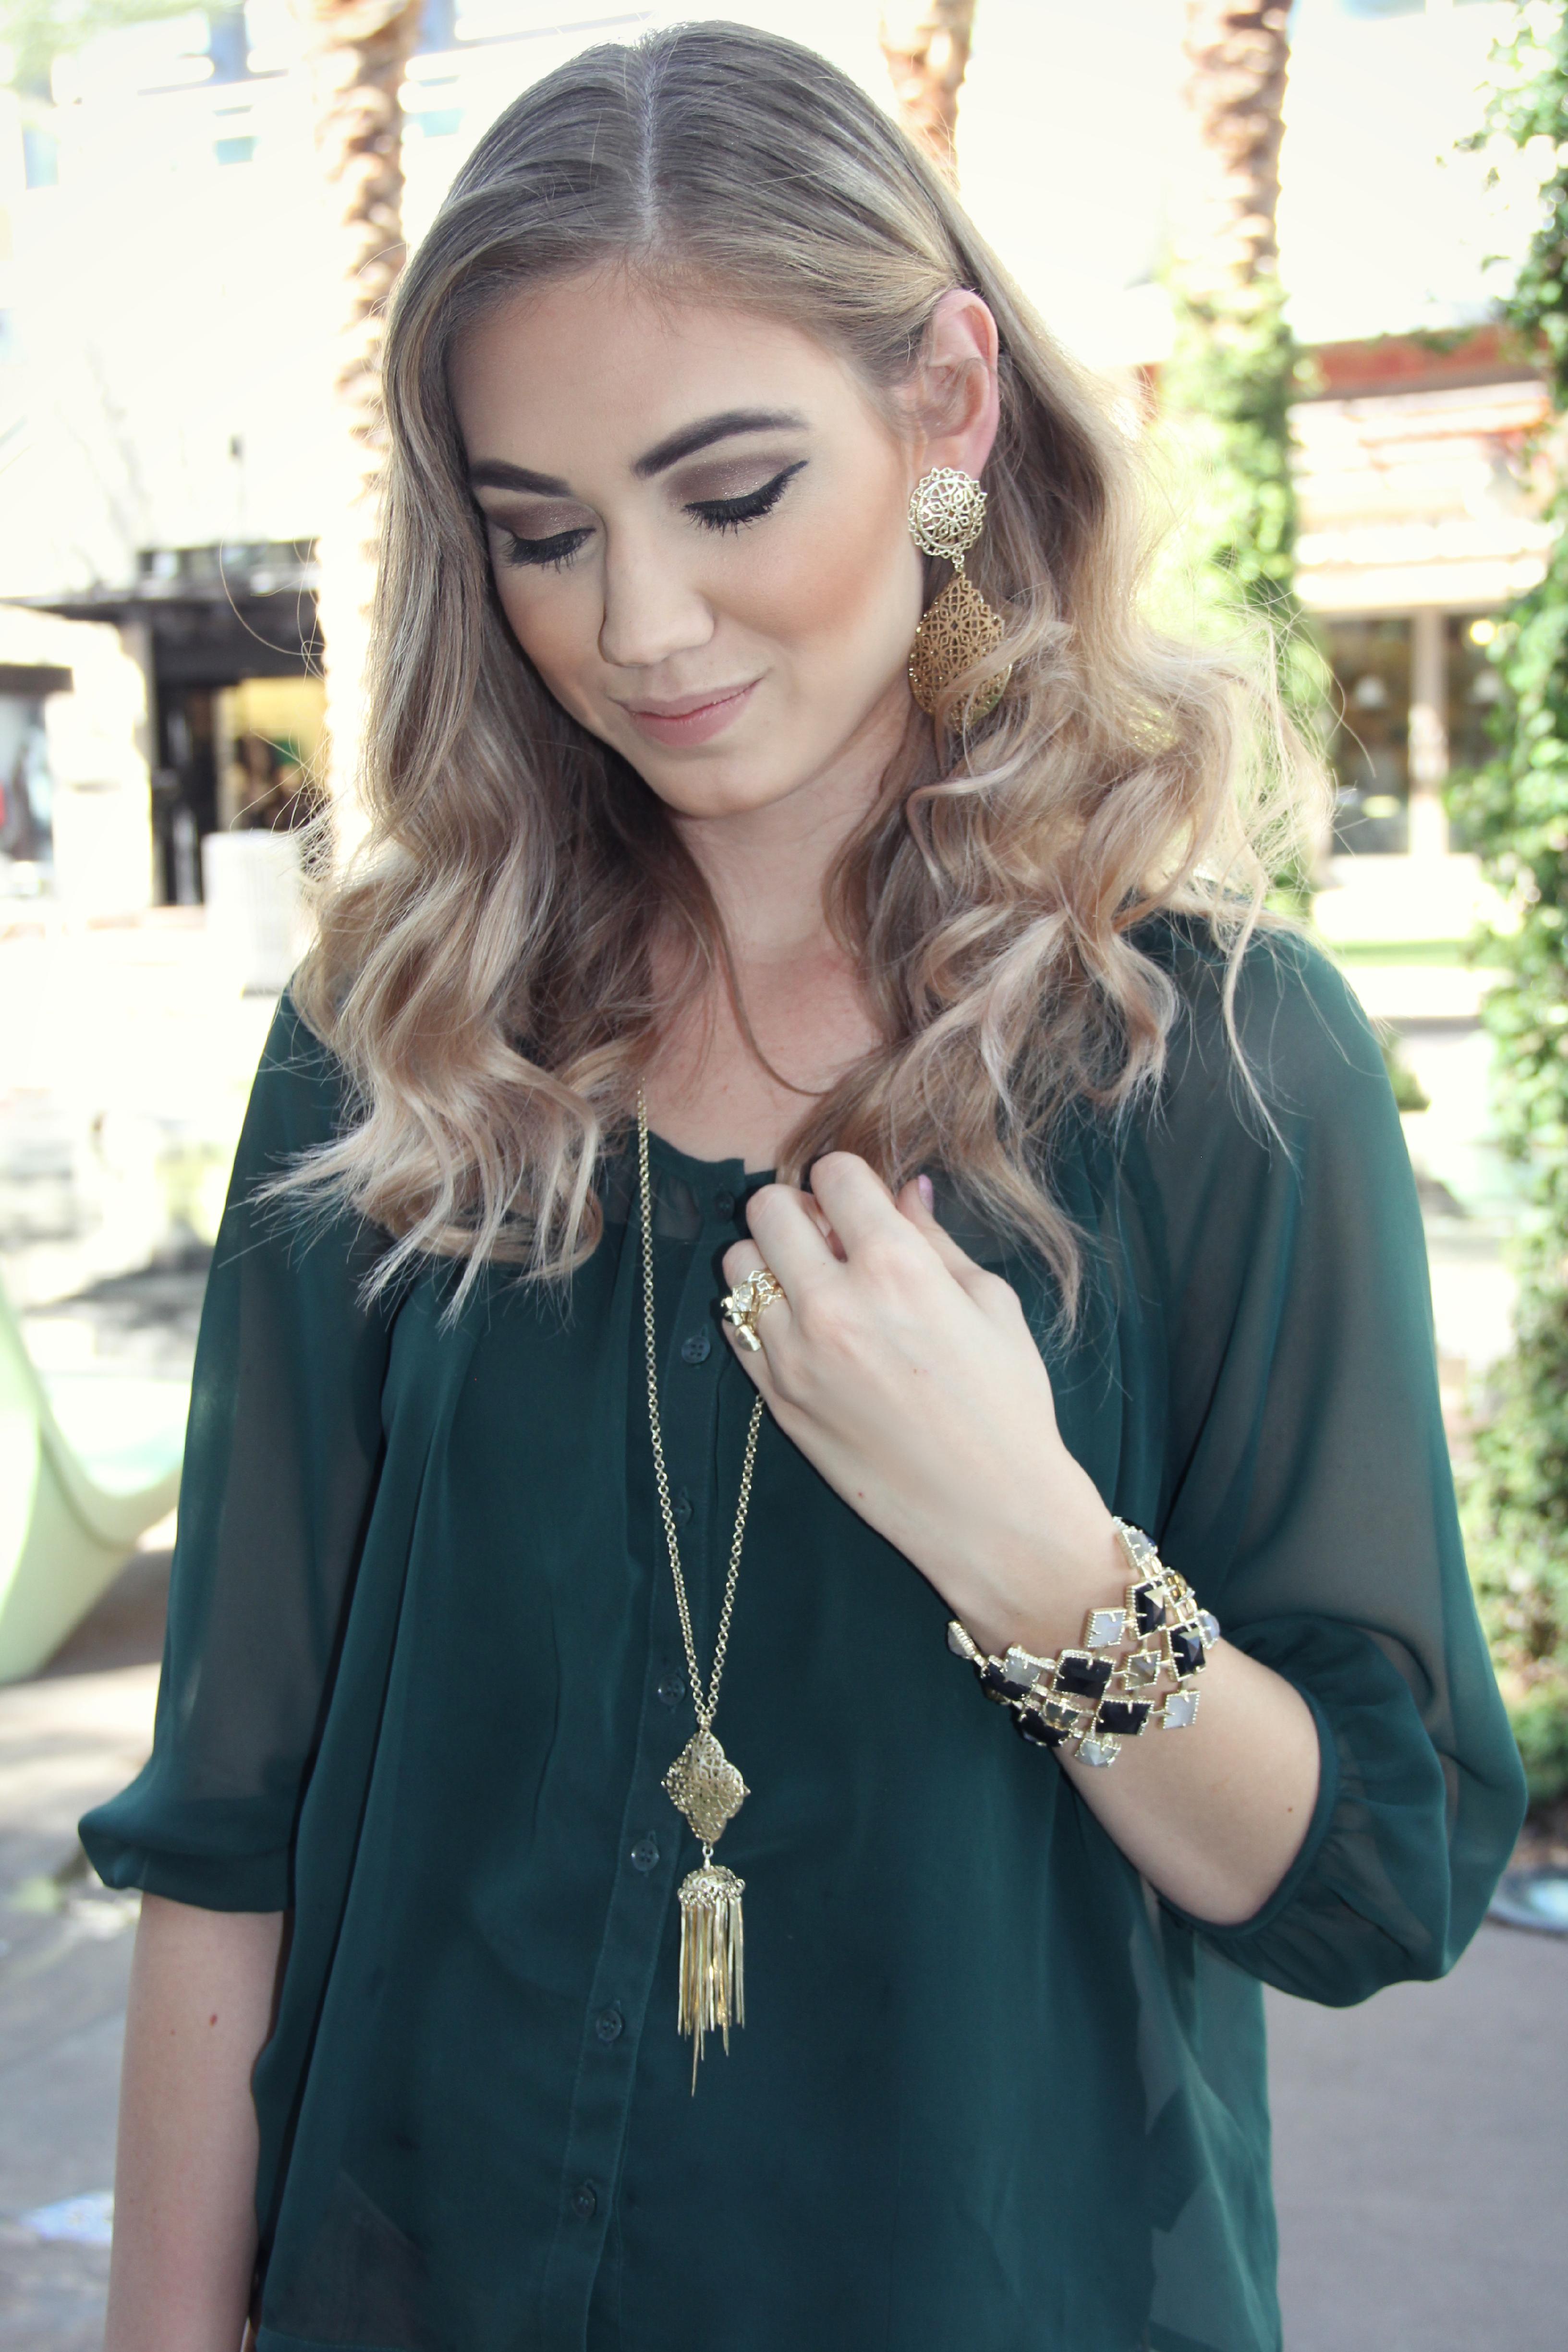 Kendra Scott Scottsdale Quarter jewelry